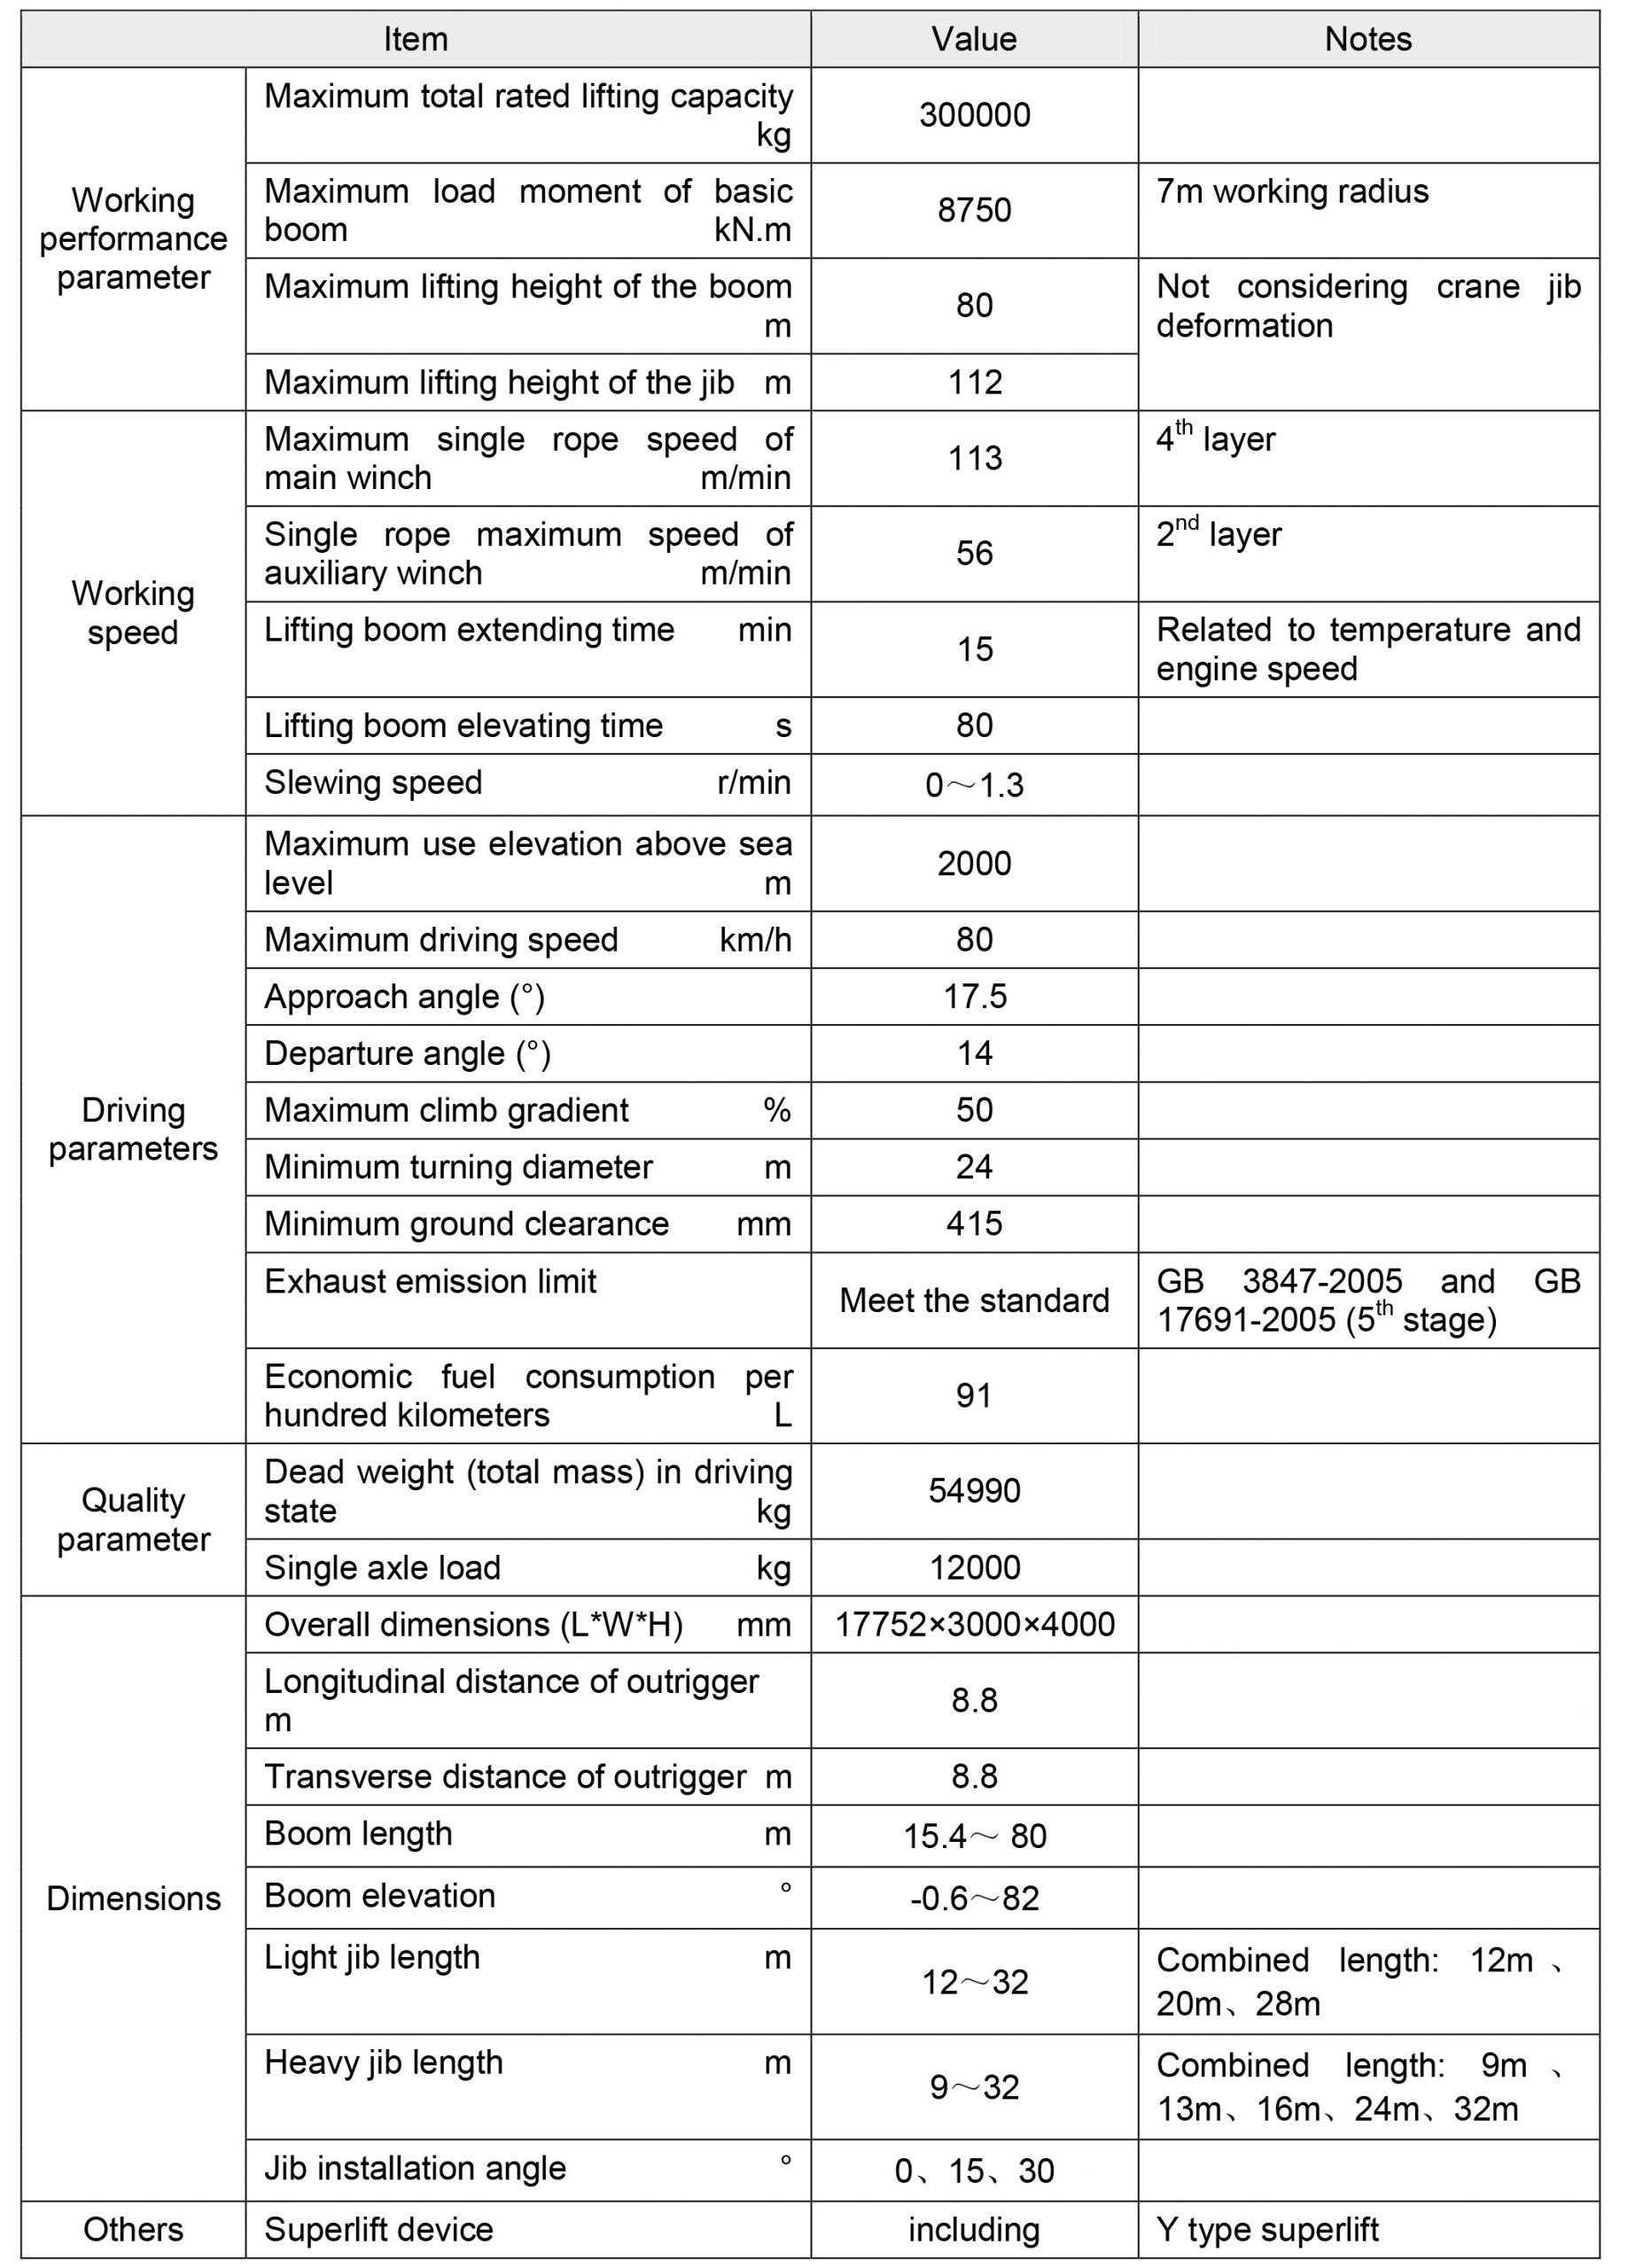 Технические характеристики полноприводного крана ZAT3000 Zoomlion